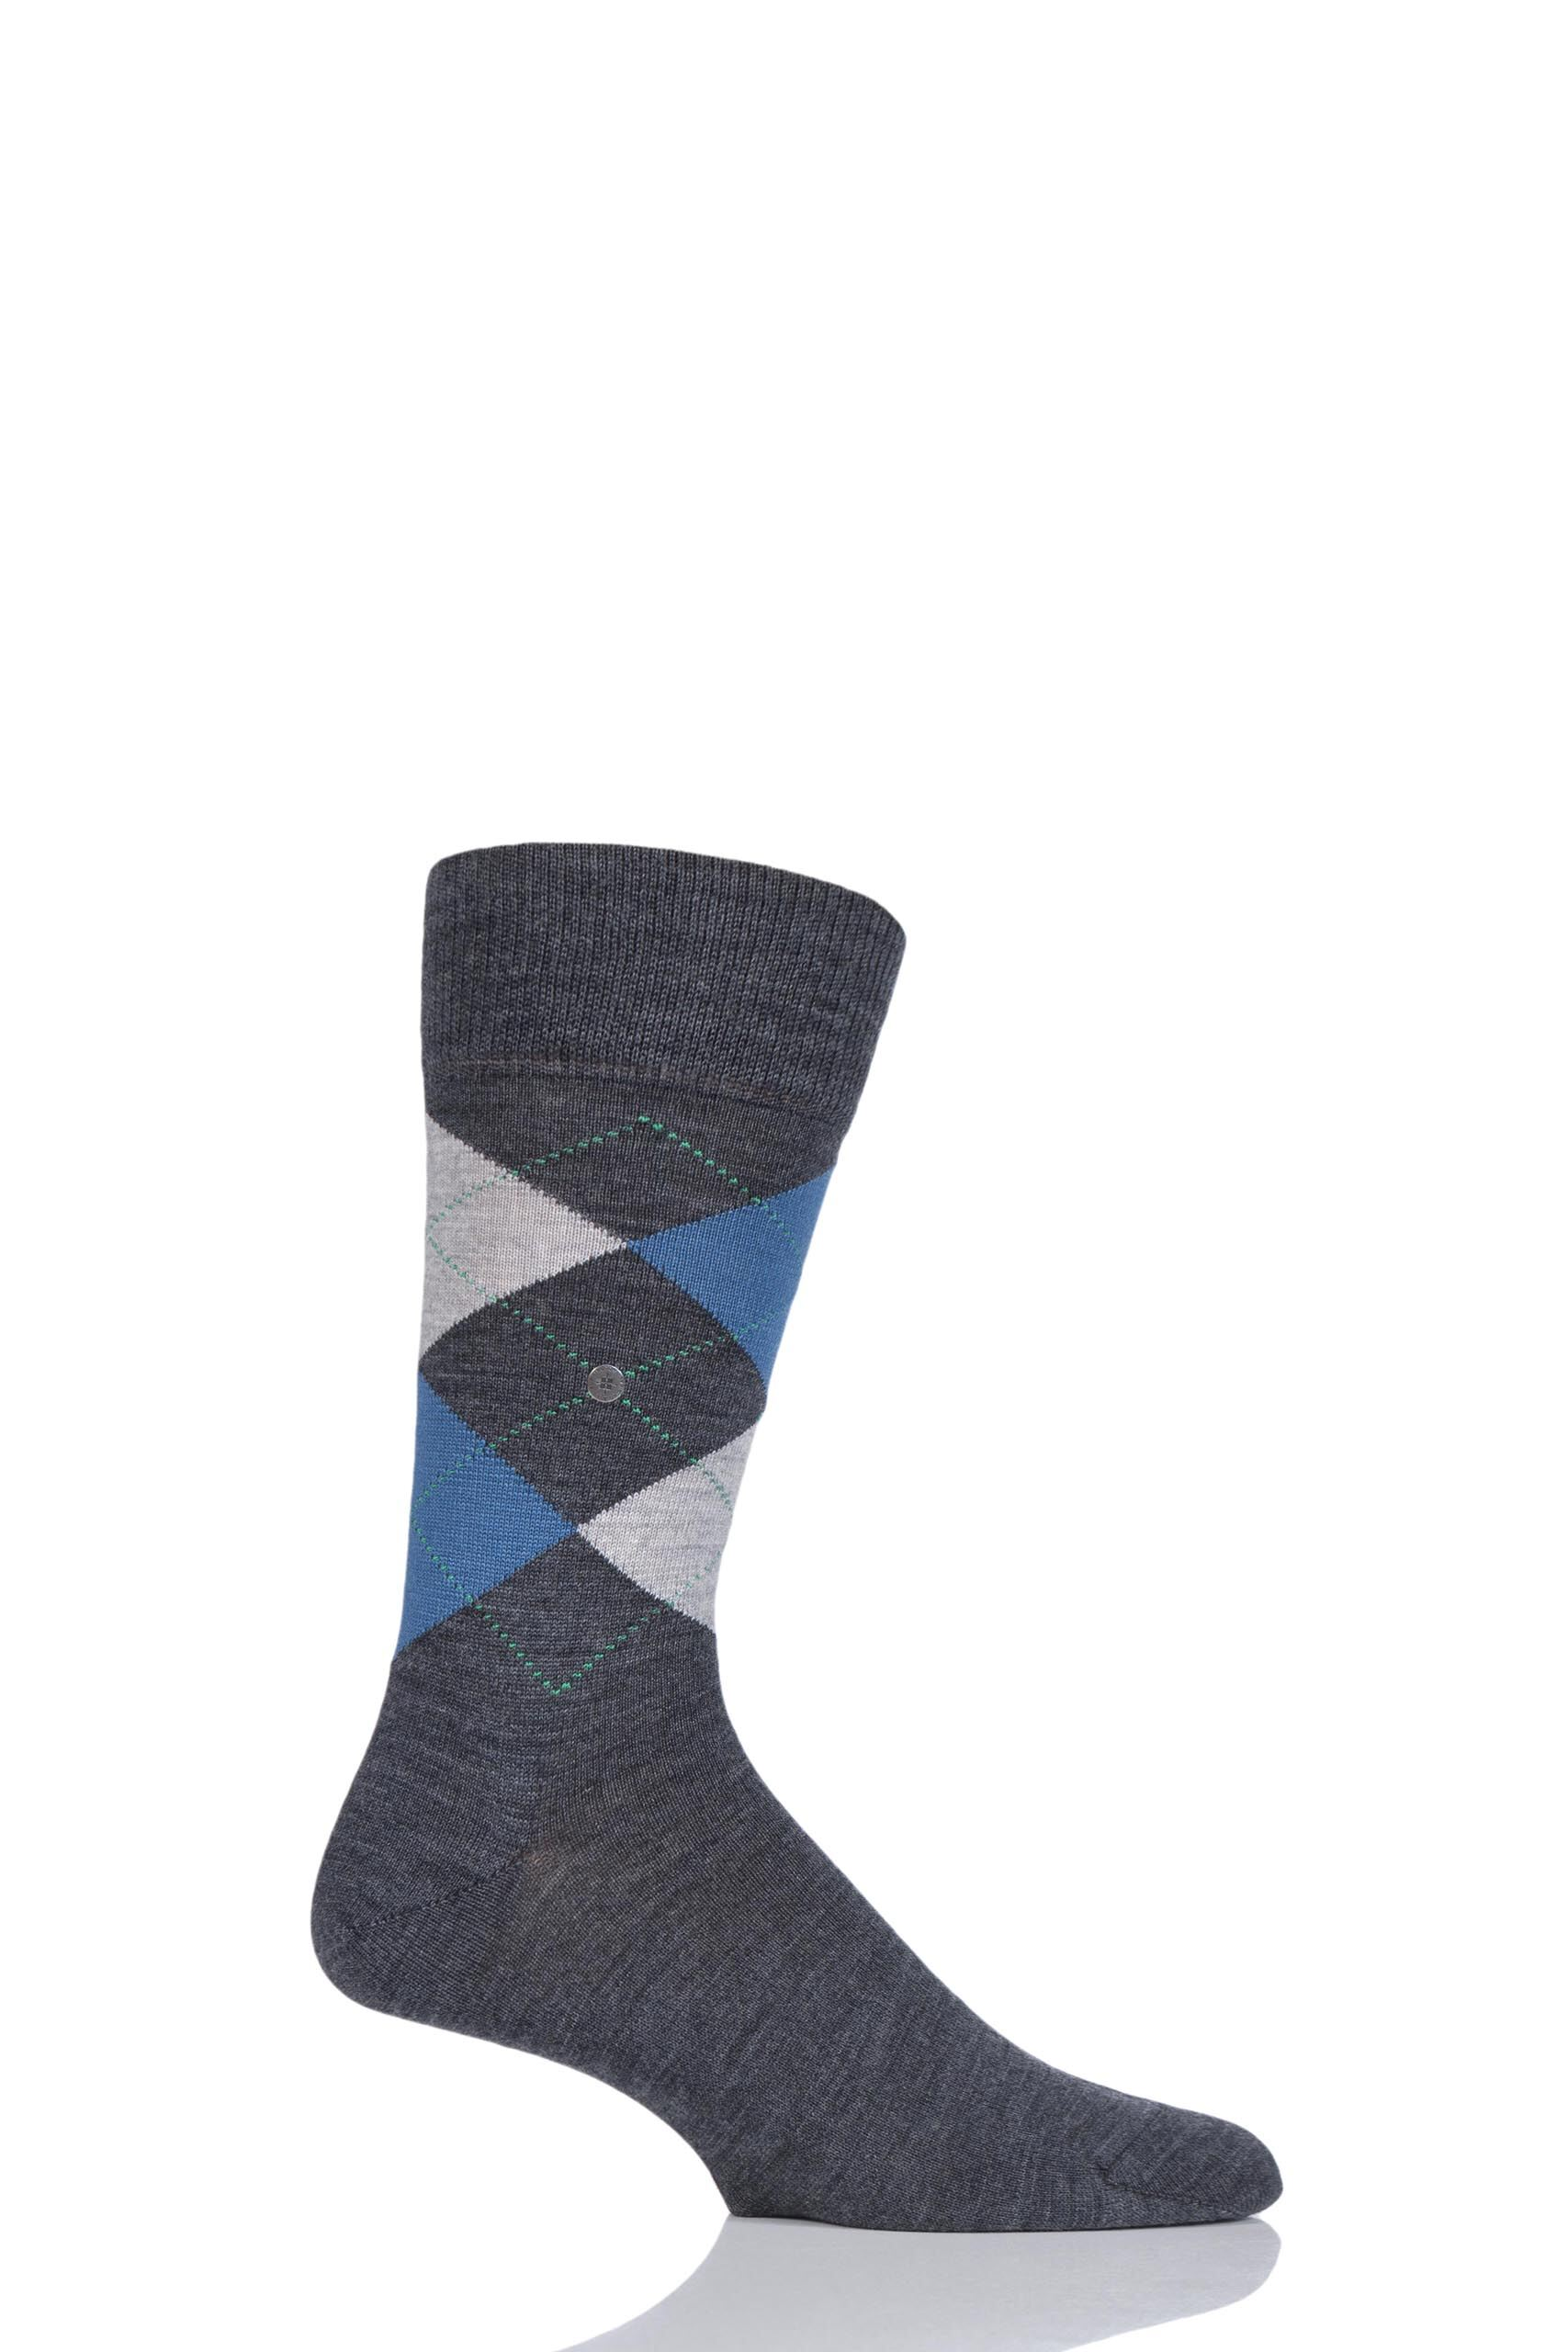 Image of 1 Pair Black / Blue Edinburgh Virgin Wool Argyle Socks Men's 6.5-11 Mens - Burlington